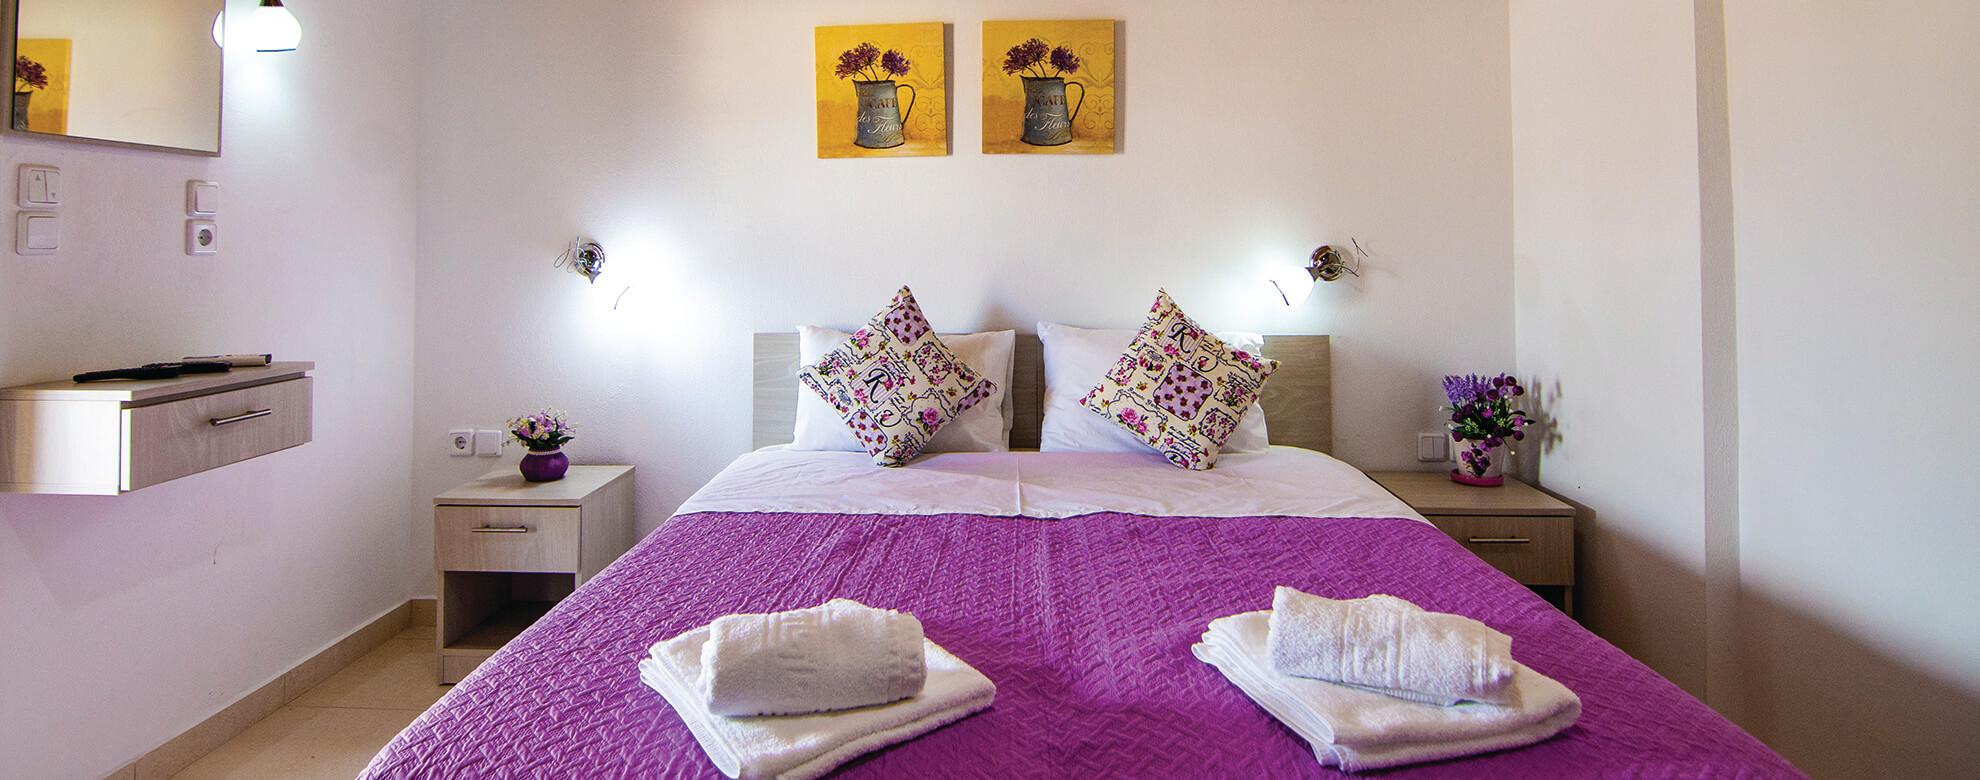 Villa Evelin Asprovalta Rooms Apartments Studios